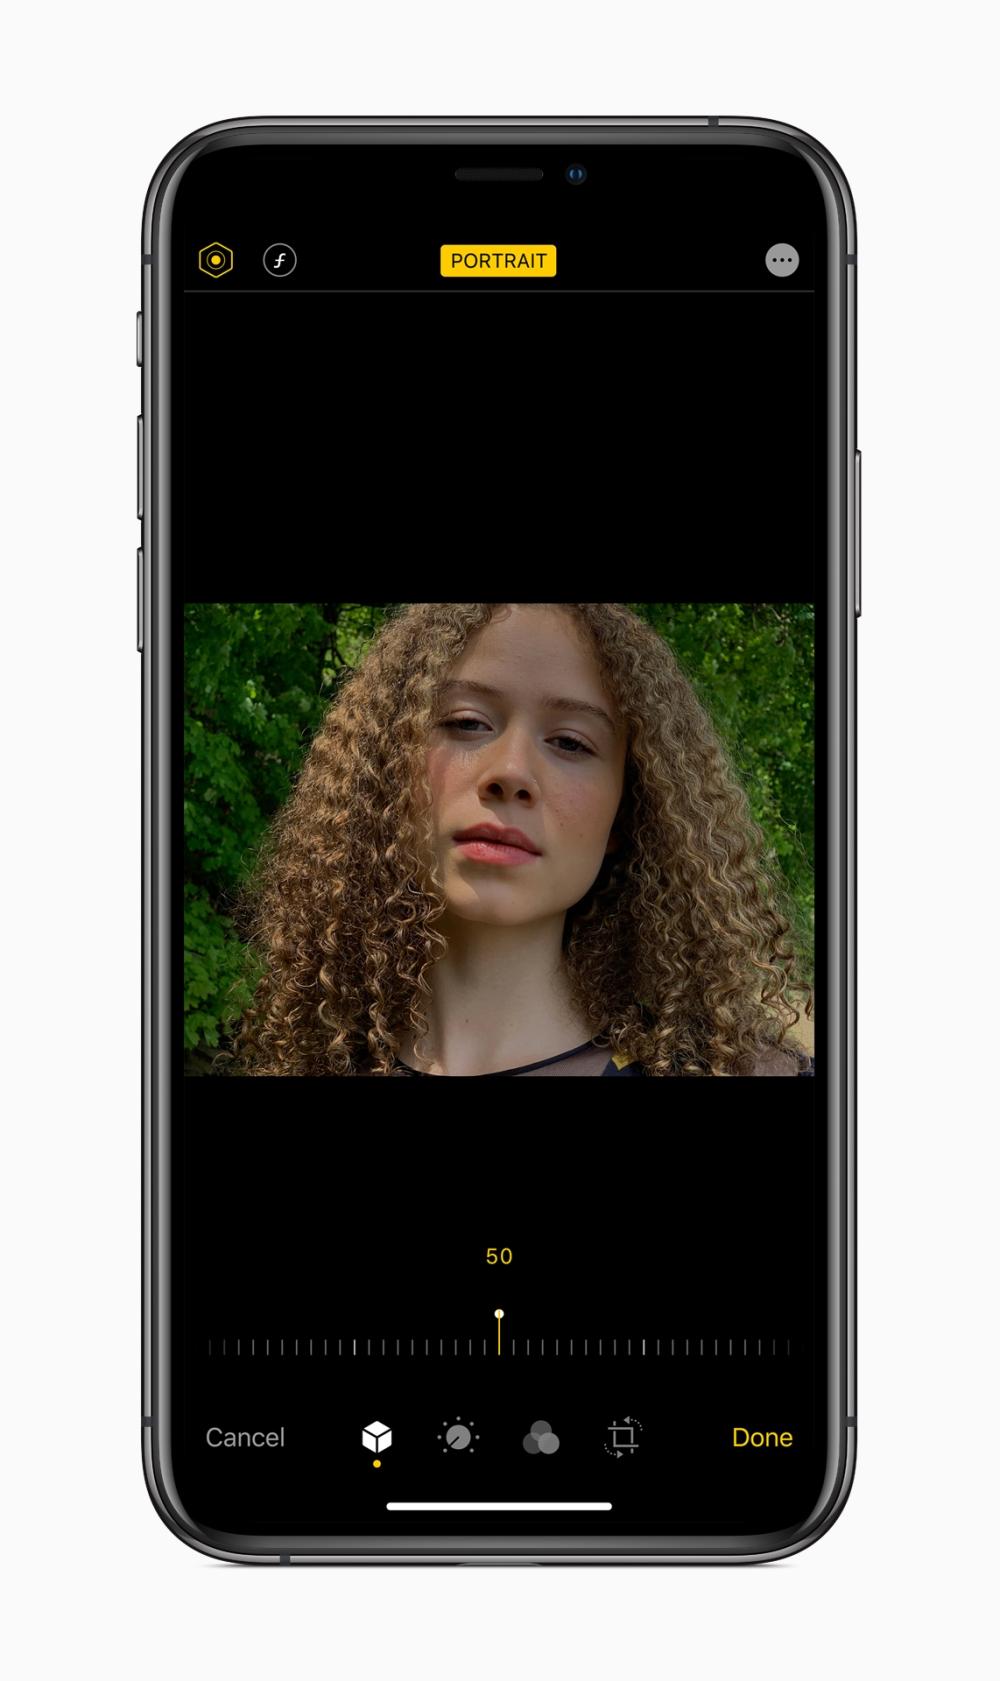 Apple-ios-13-portrait-screen-iphone-xs-06032019